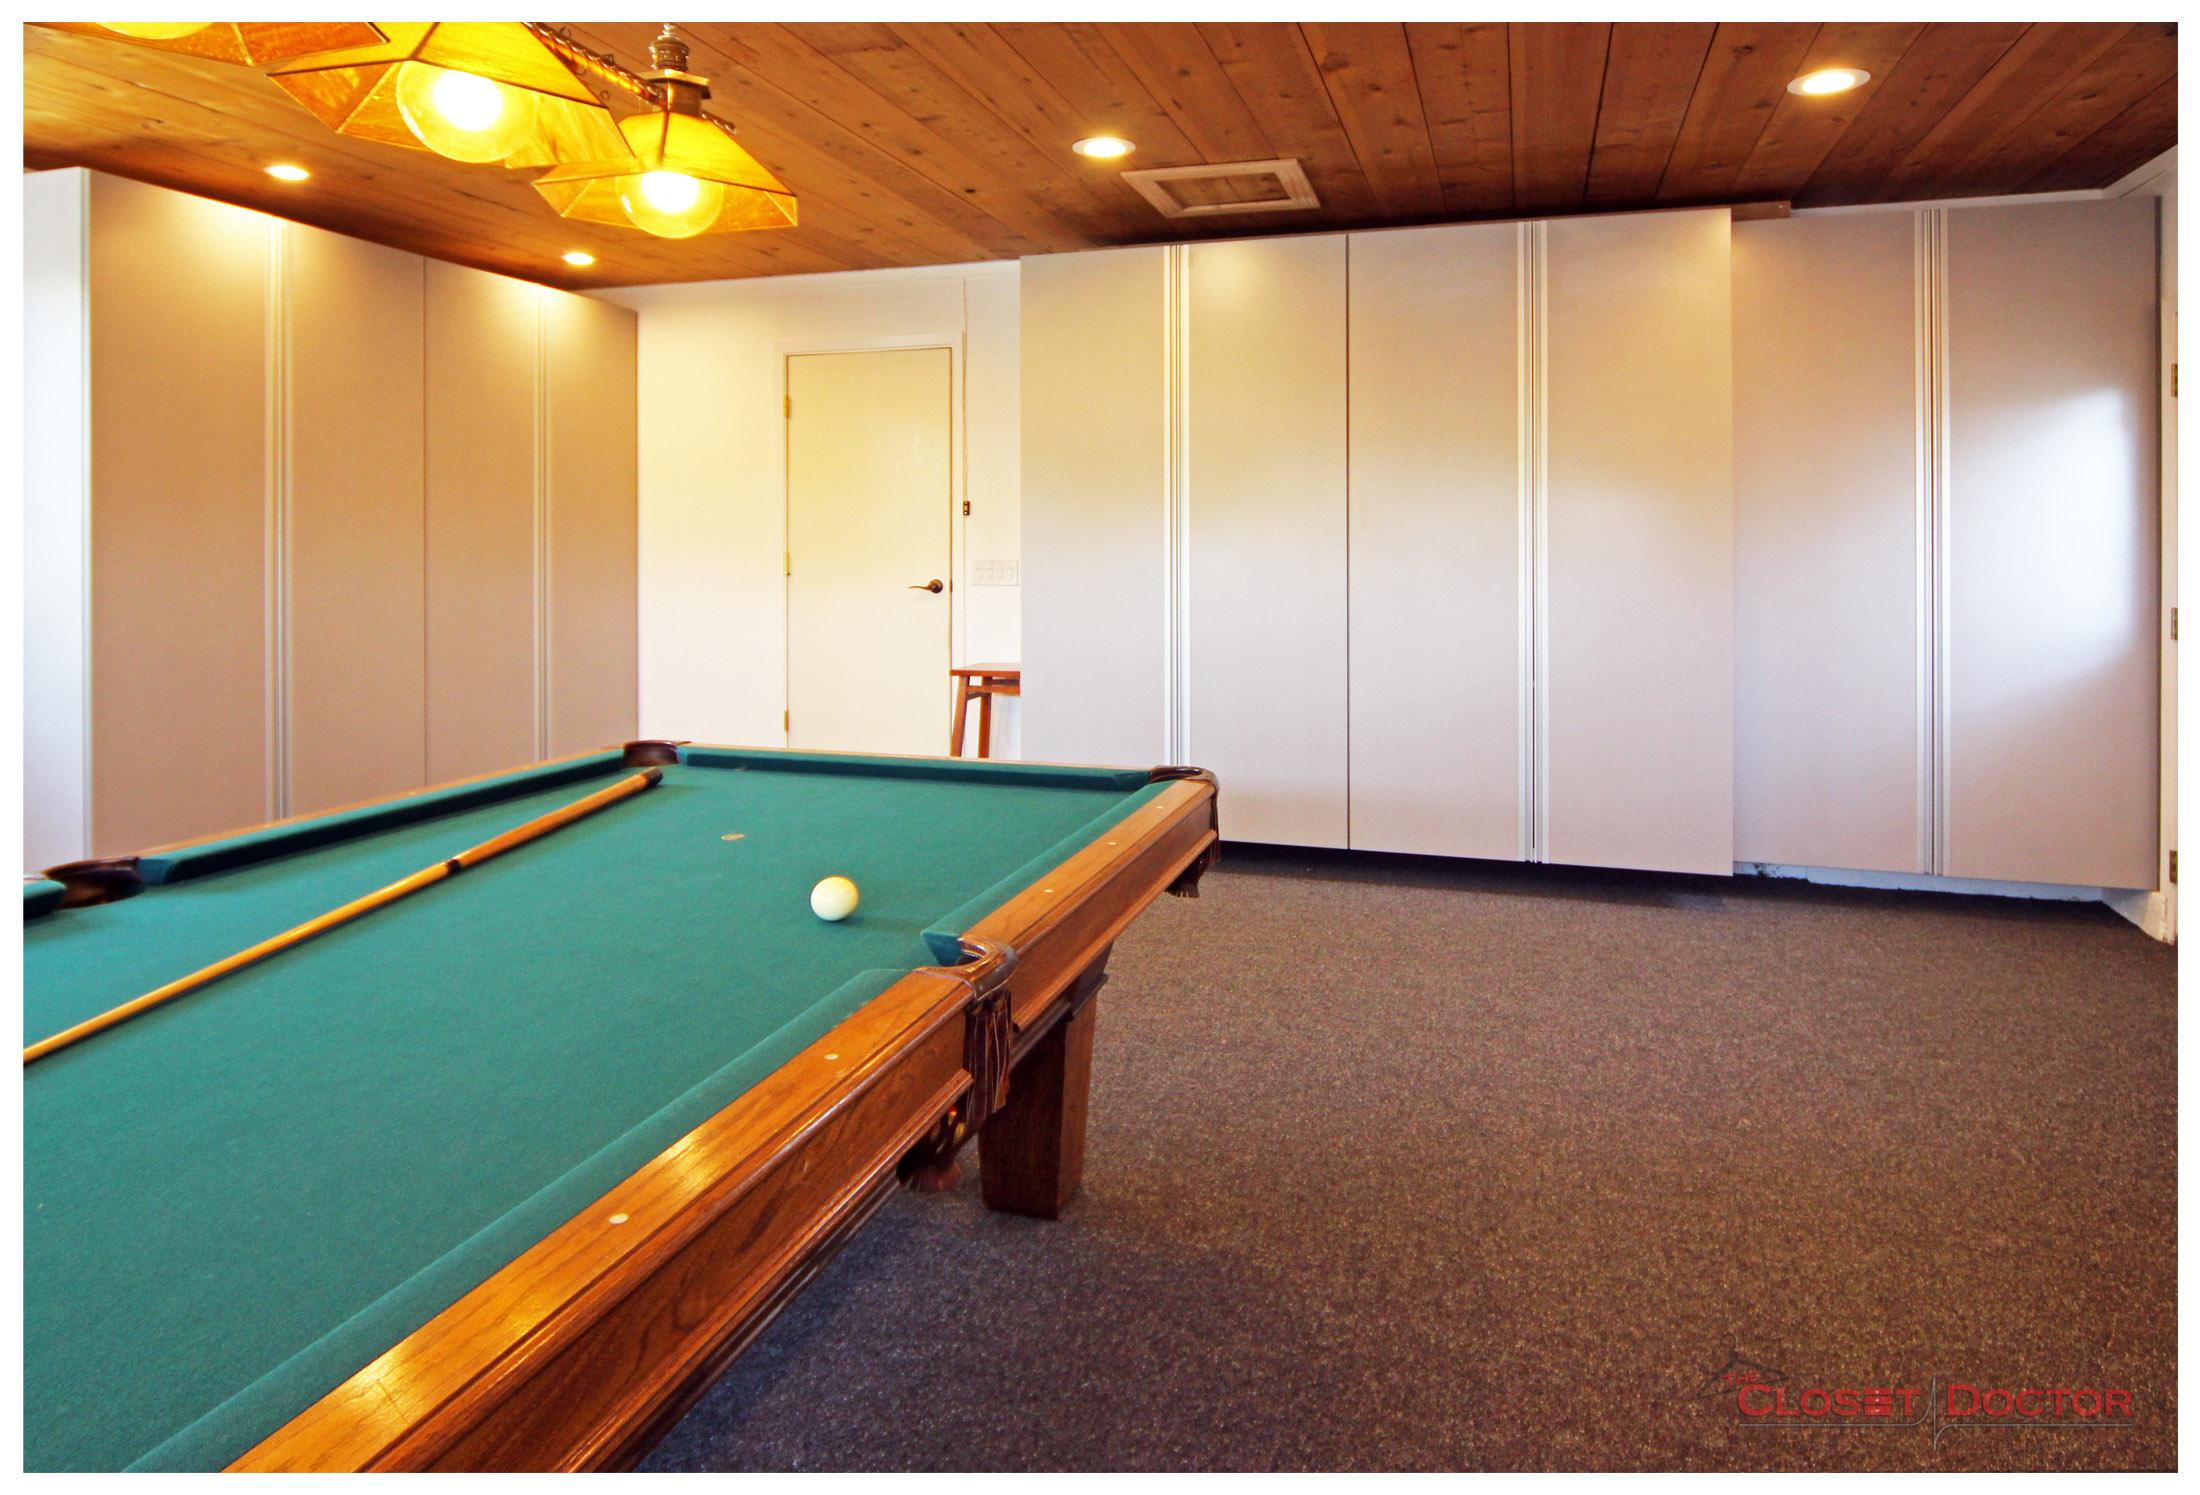 18-custom-garage-cabinets-the-closet-doctor-lincoln-roseville-sacramento-Hillier.jpg